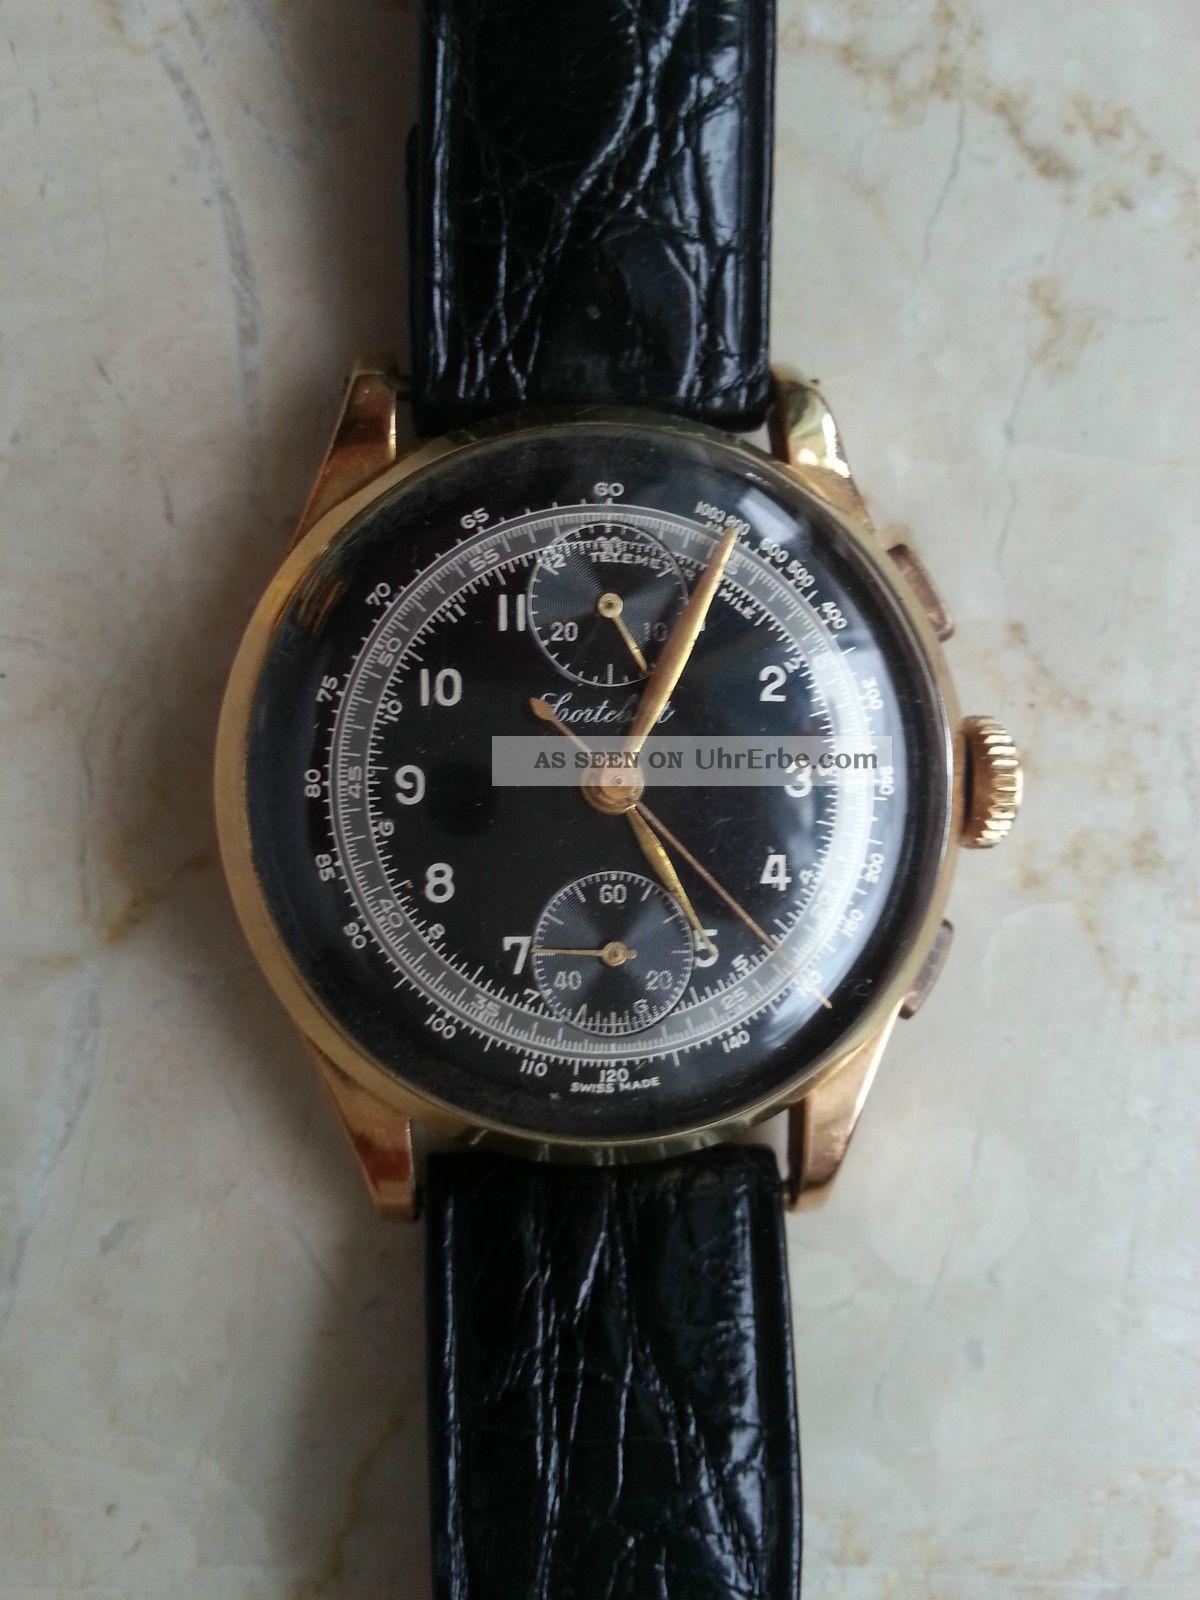 Uhr Gold Vergoldet Stempel 223 & 158 Swiss Chronograph Cortébert Armbanduhren Bild